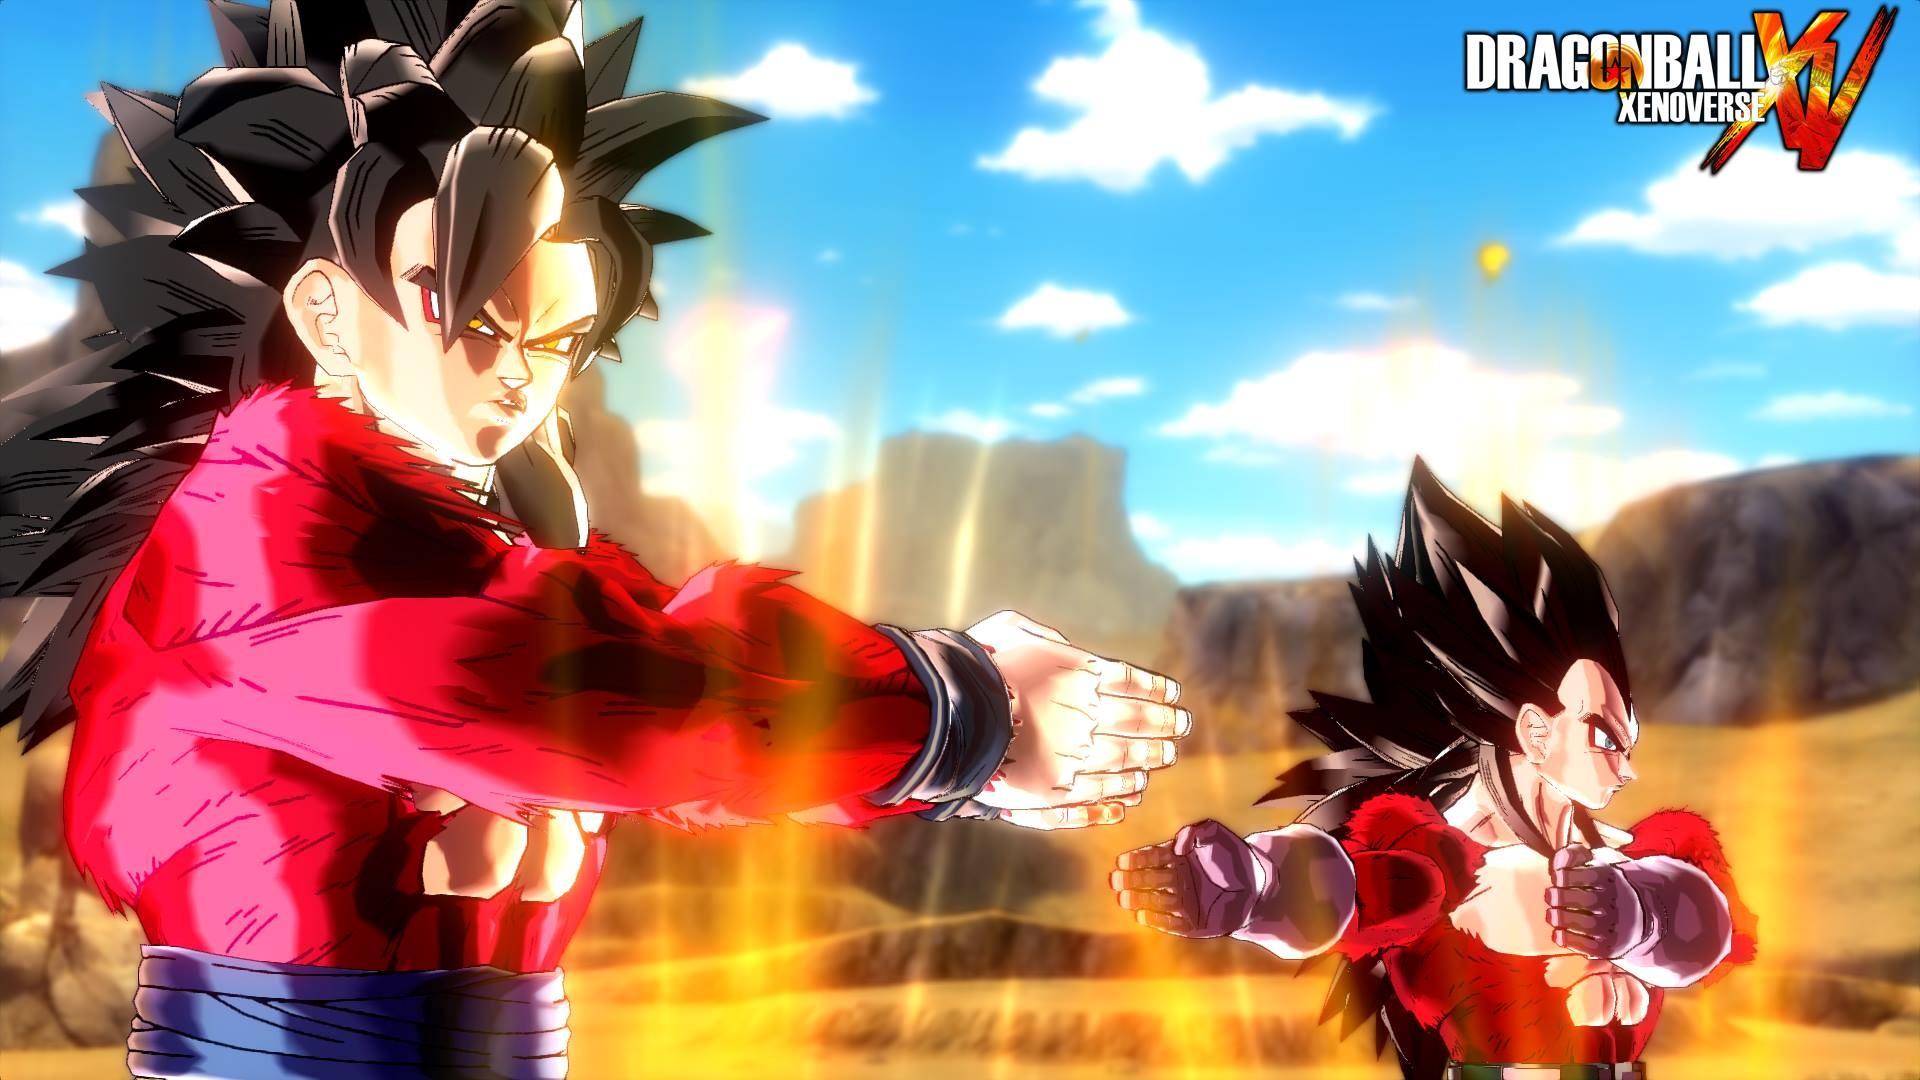 Gohan Wallpaper 3d Dragon Ball Xenoverse Le 2nd Dlc En Images